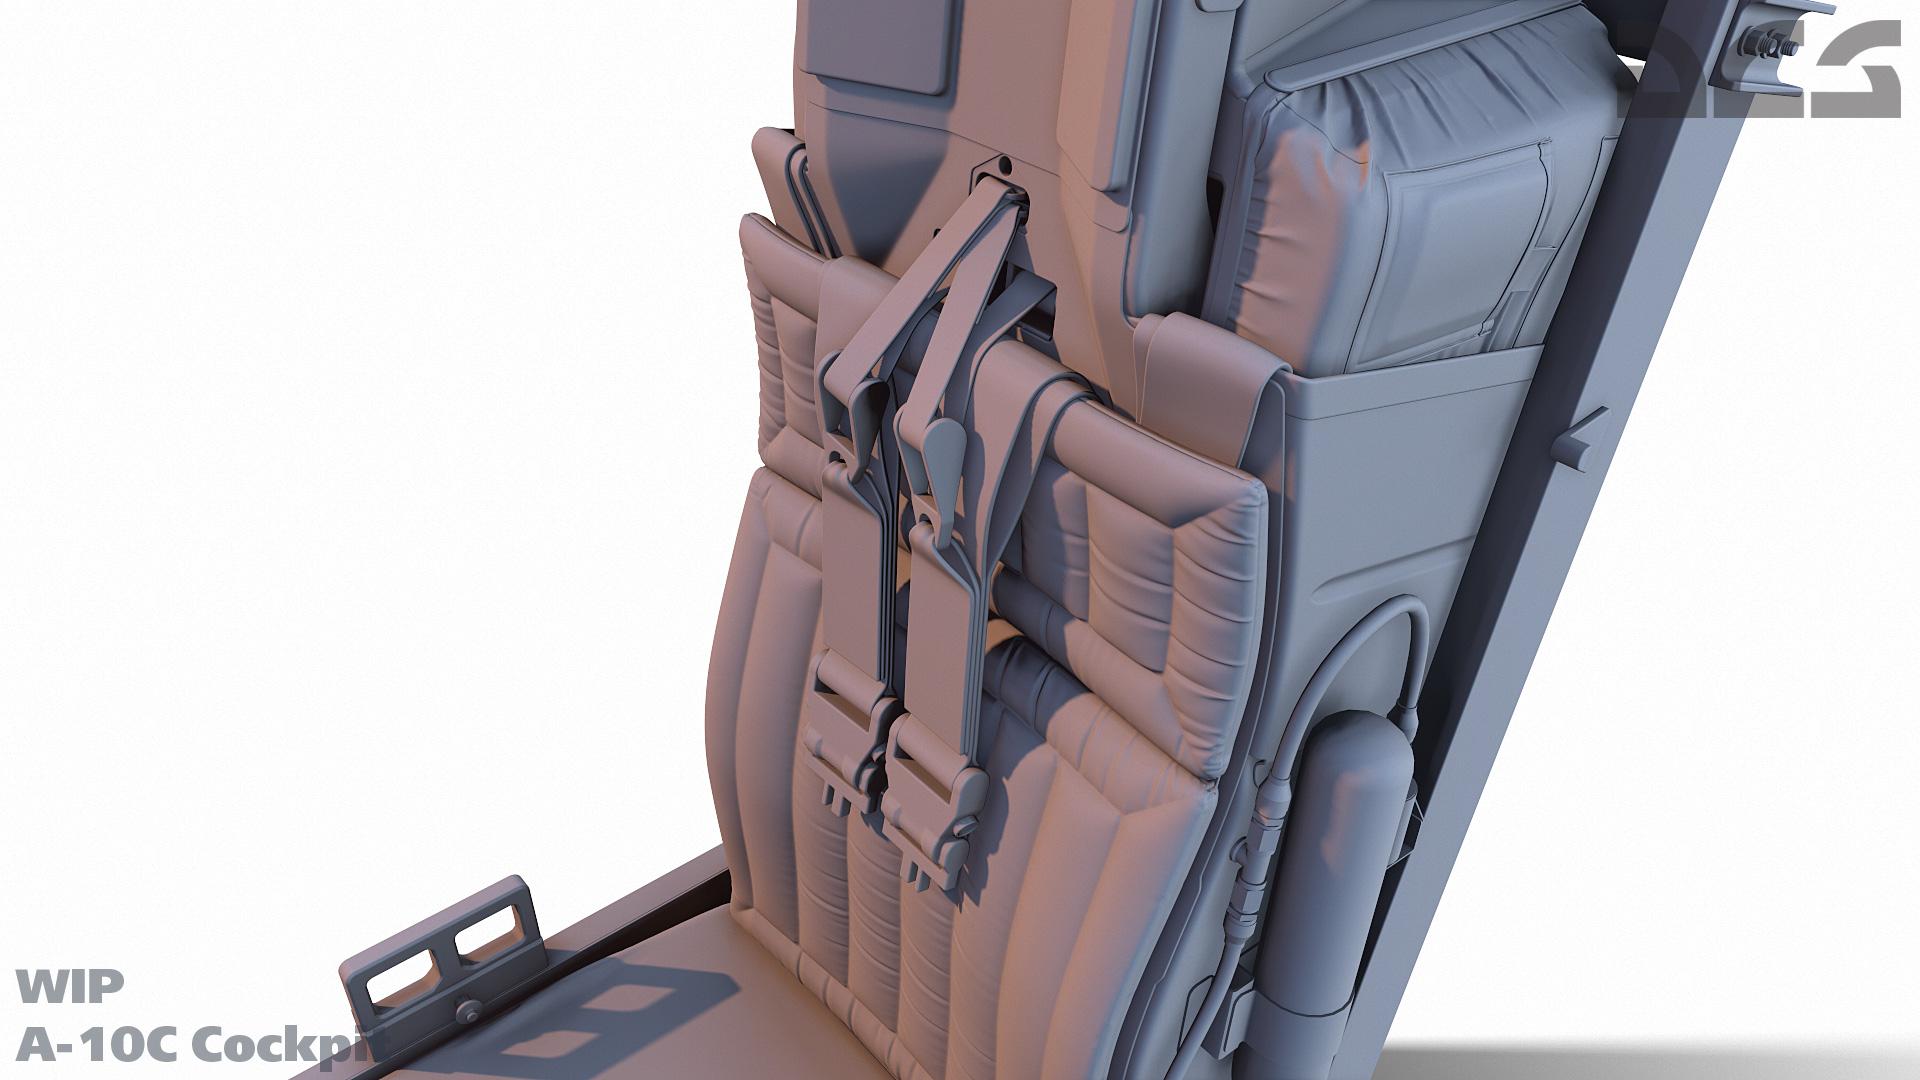 www.digitalcombatsimulator.com/upload/iblock/319/A-10C-New-Cockpit-04.jpg